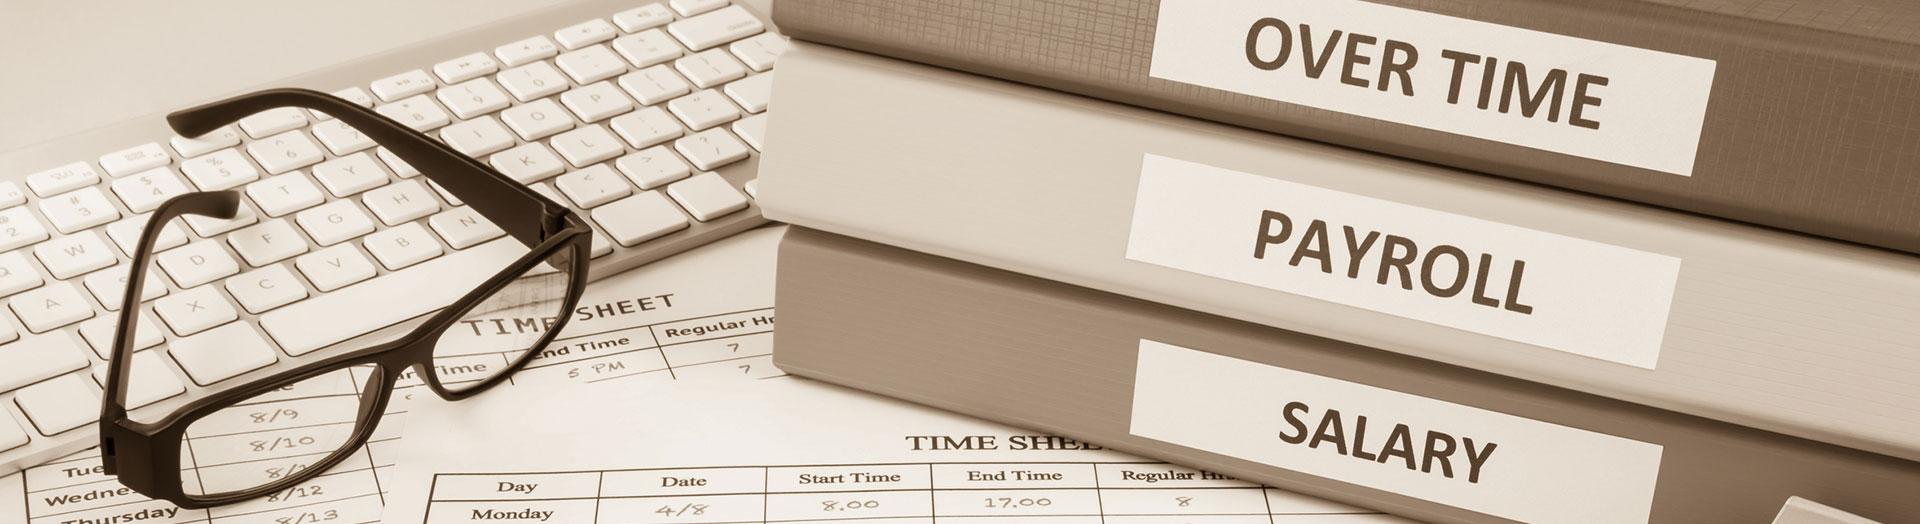 Employii Payroll Case Study